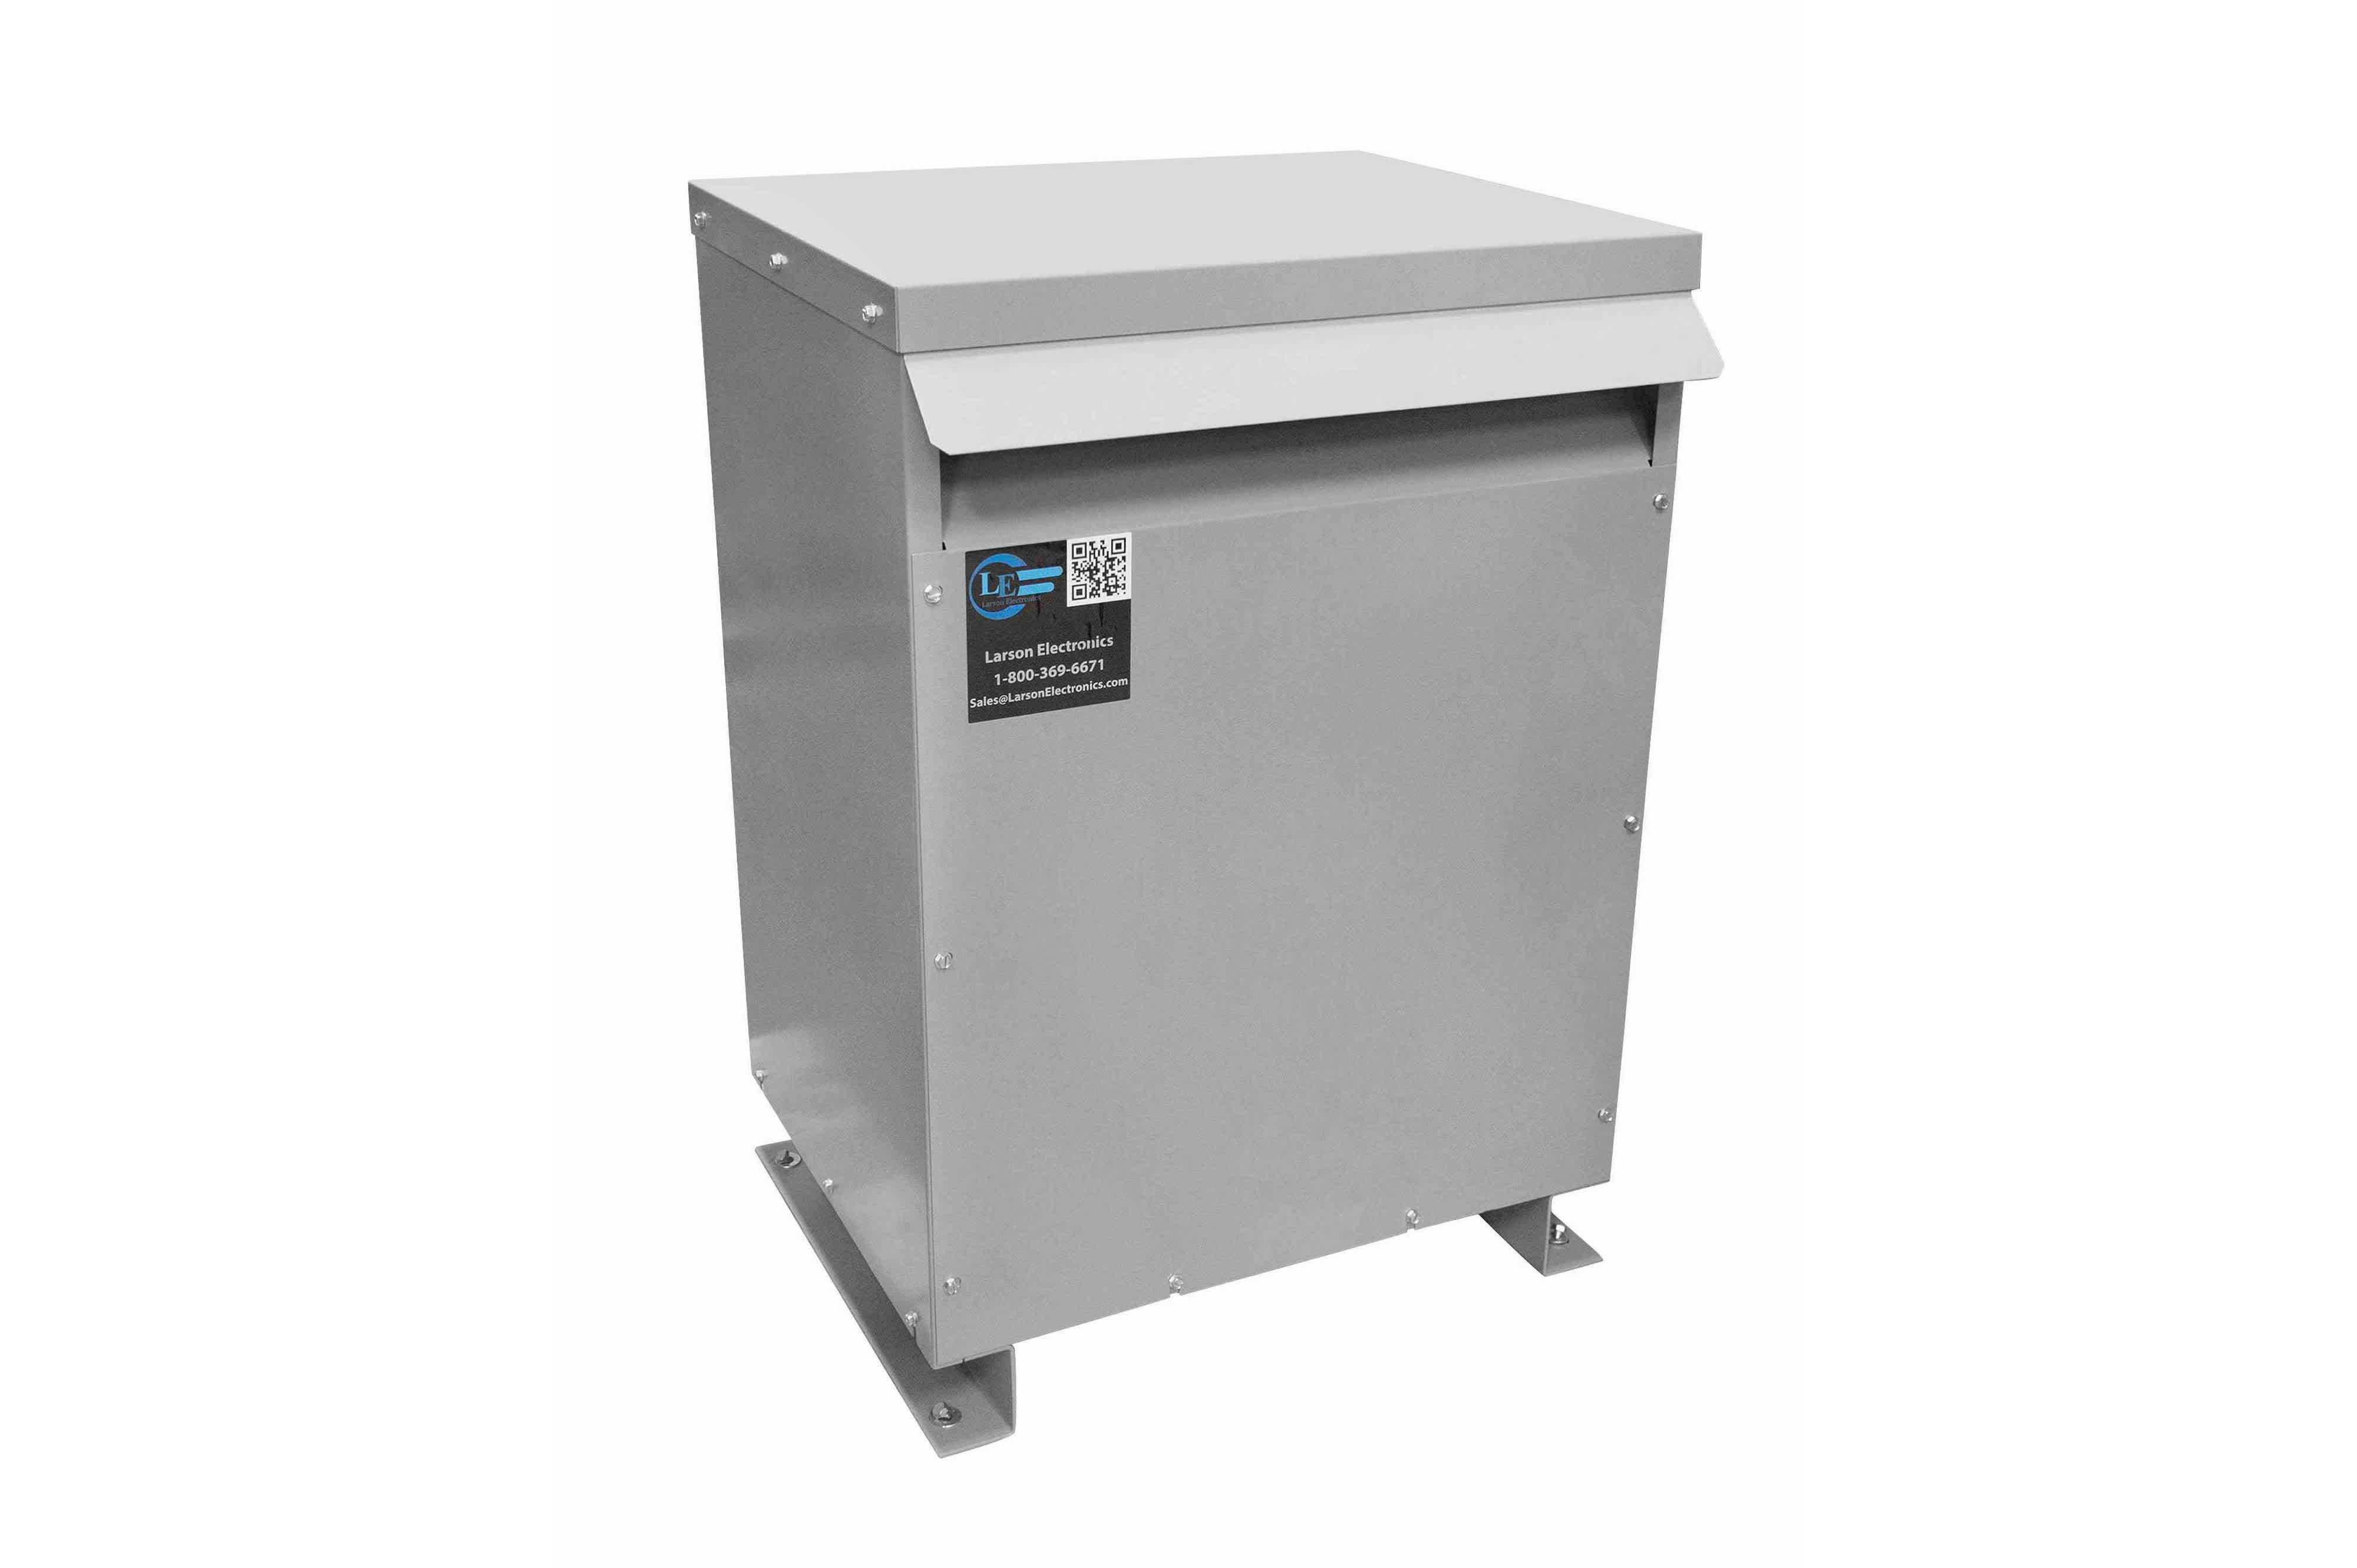 800 kVA 3PH DOE Transformer, 400V Delta Primary, 480Y/277 Wye-N Secondary, N3R, Ventilated, 60 Hz